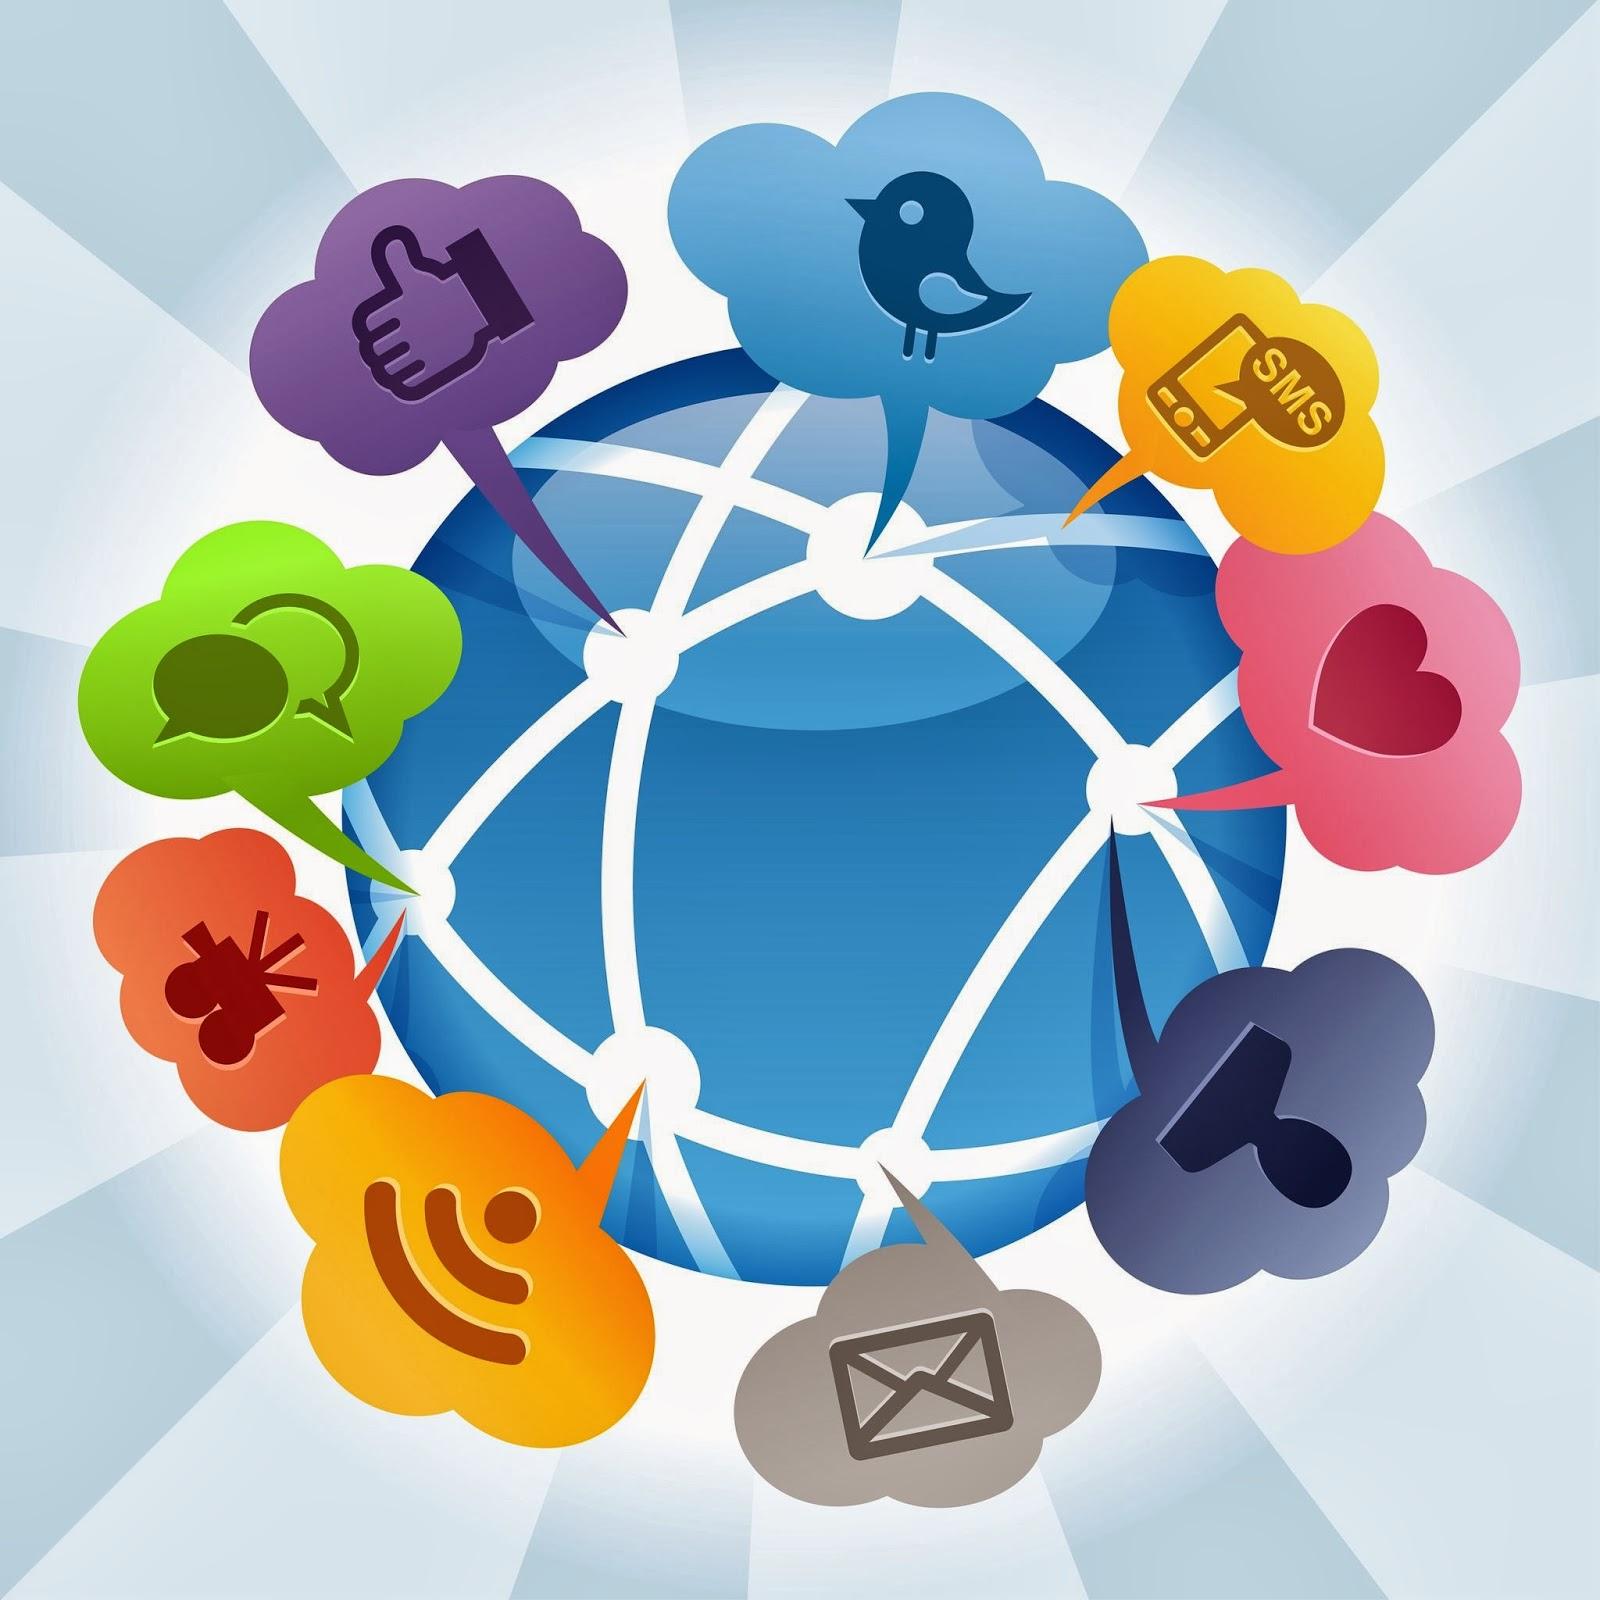 Perfil del Internauta - Navegantes en Red - FenixDirecto Blog